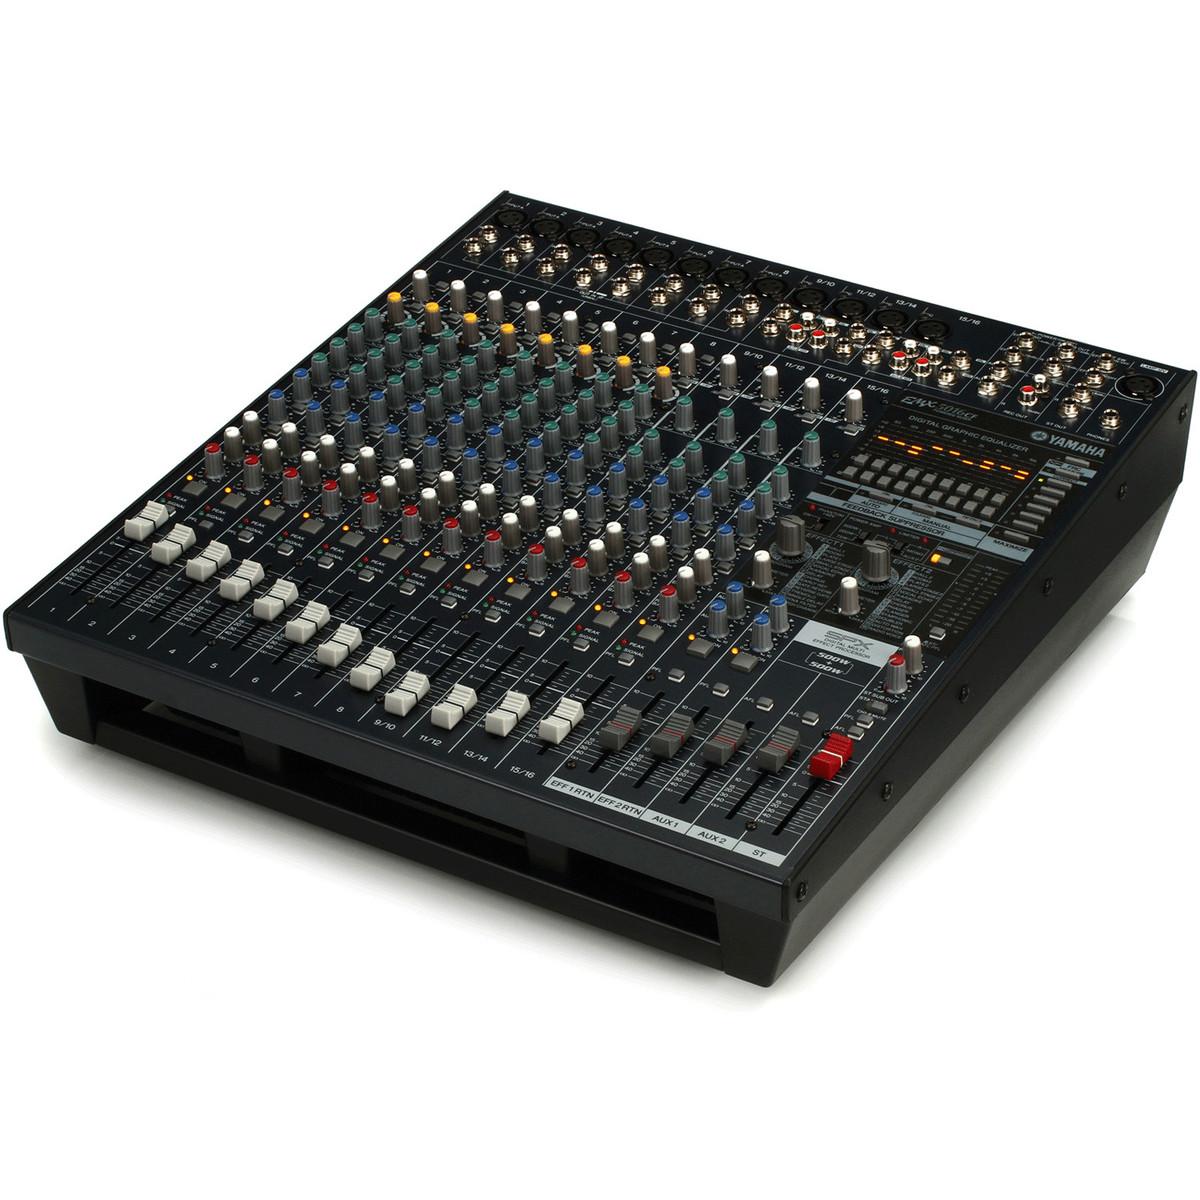 Yamaha emx5016cf table de mixage st r o amplifi e 500 w 500 w gear4music - Table de mixage amplifiee yamaha ...